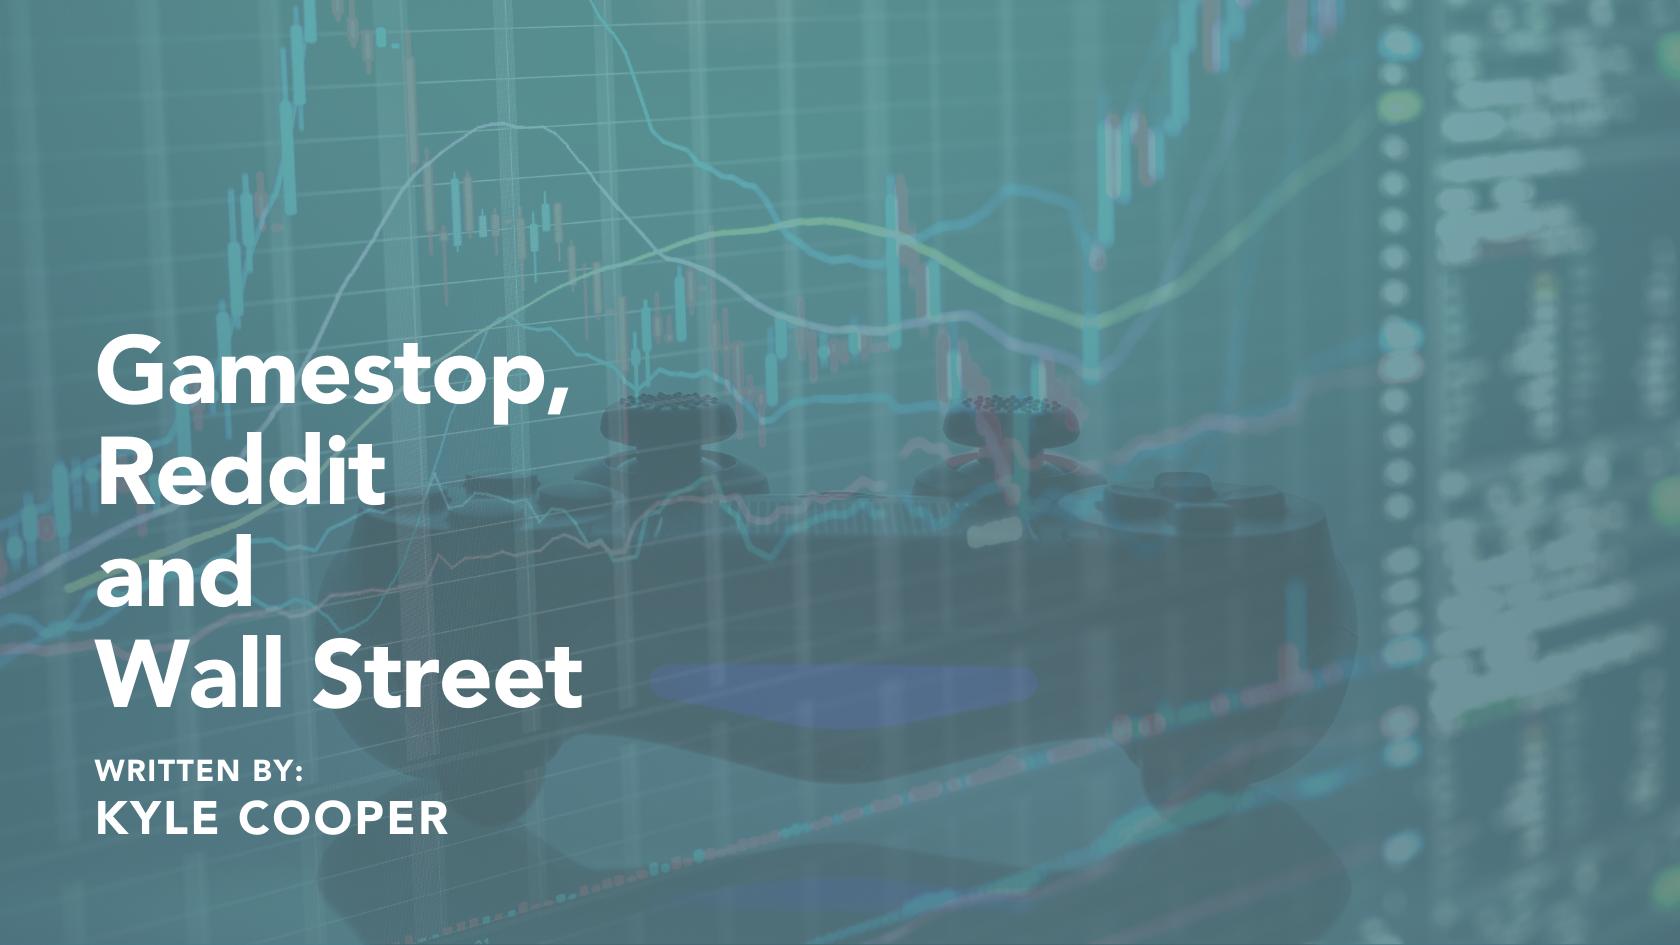 Gamestop, Reddit and Wall Street Thumbnail